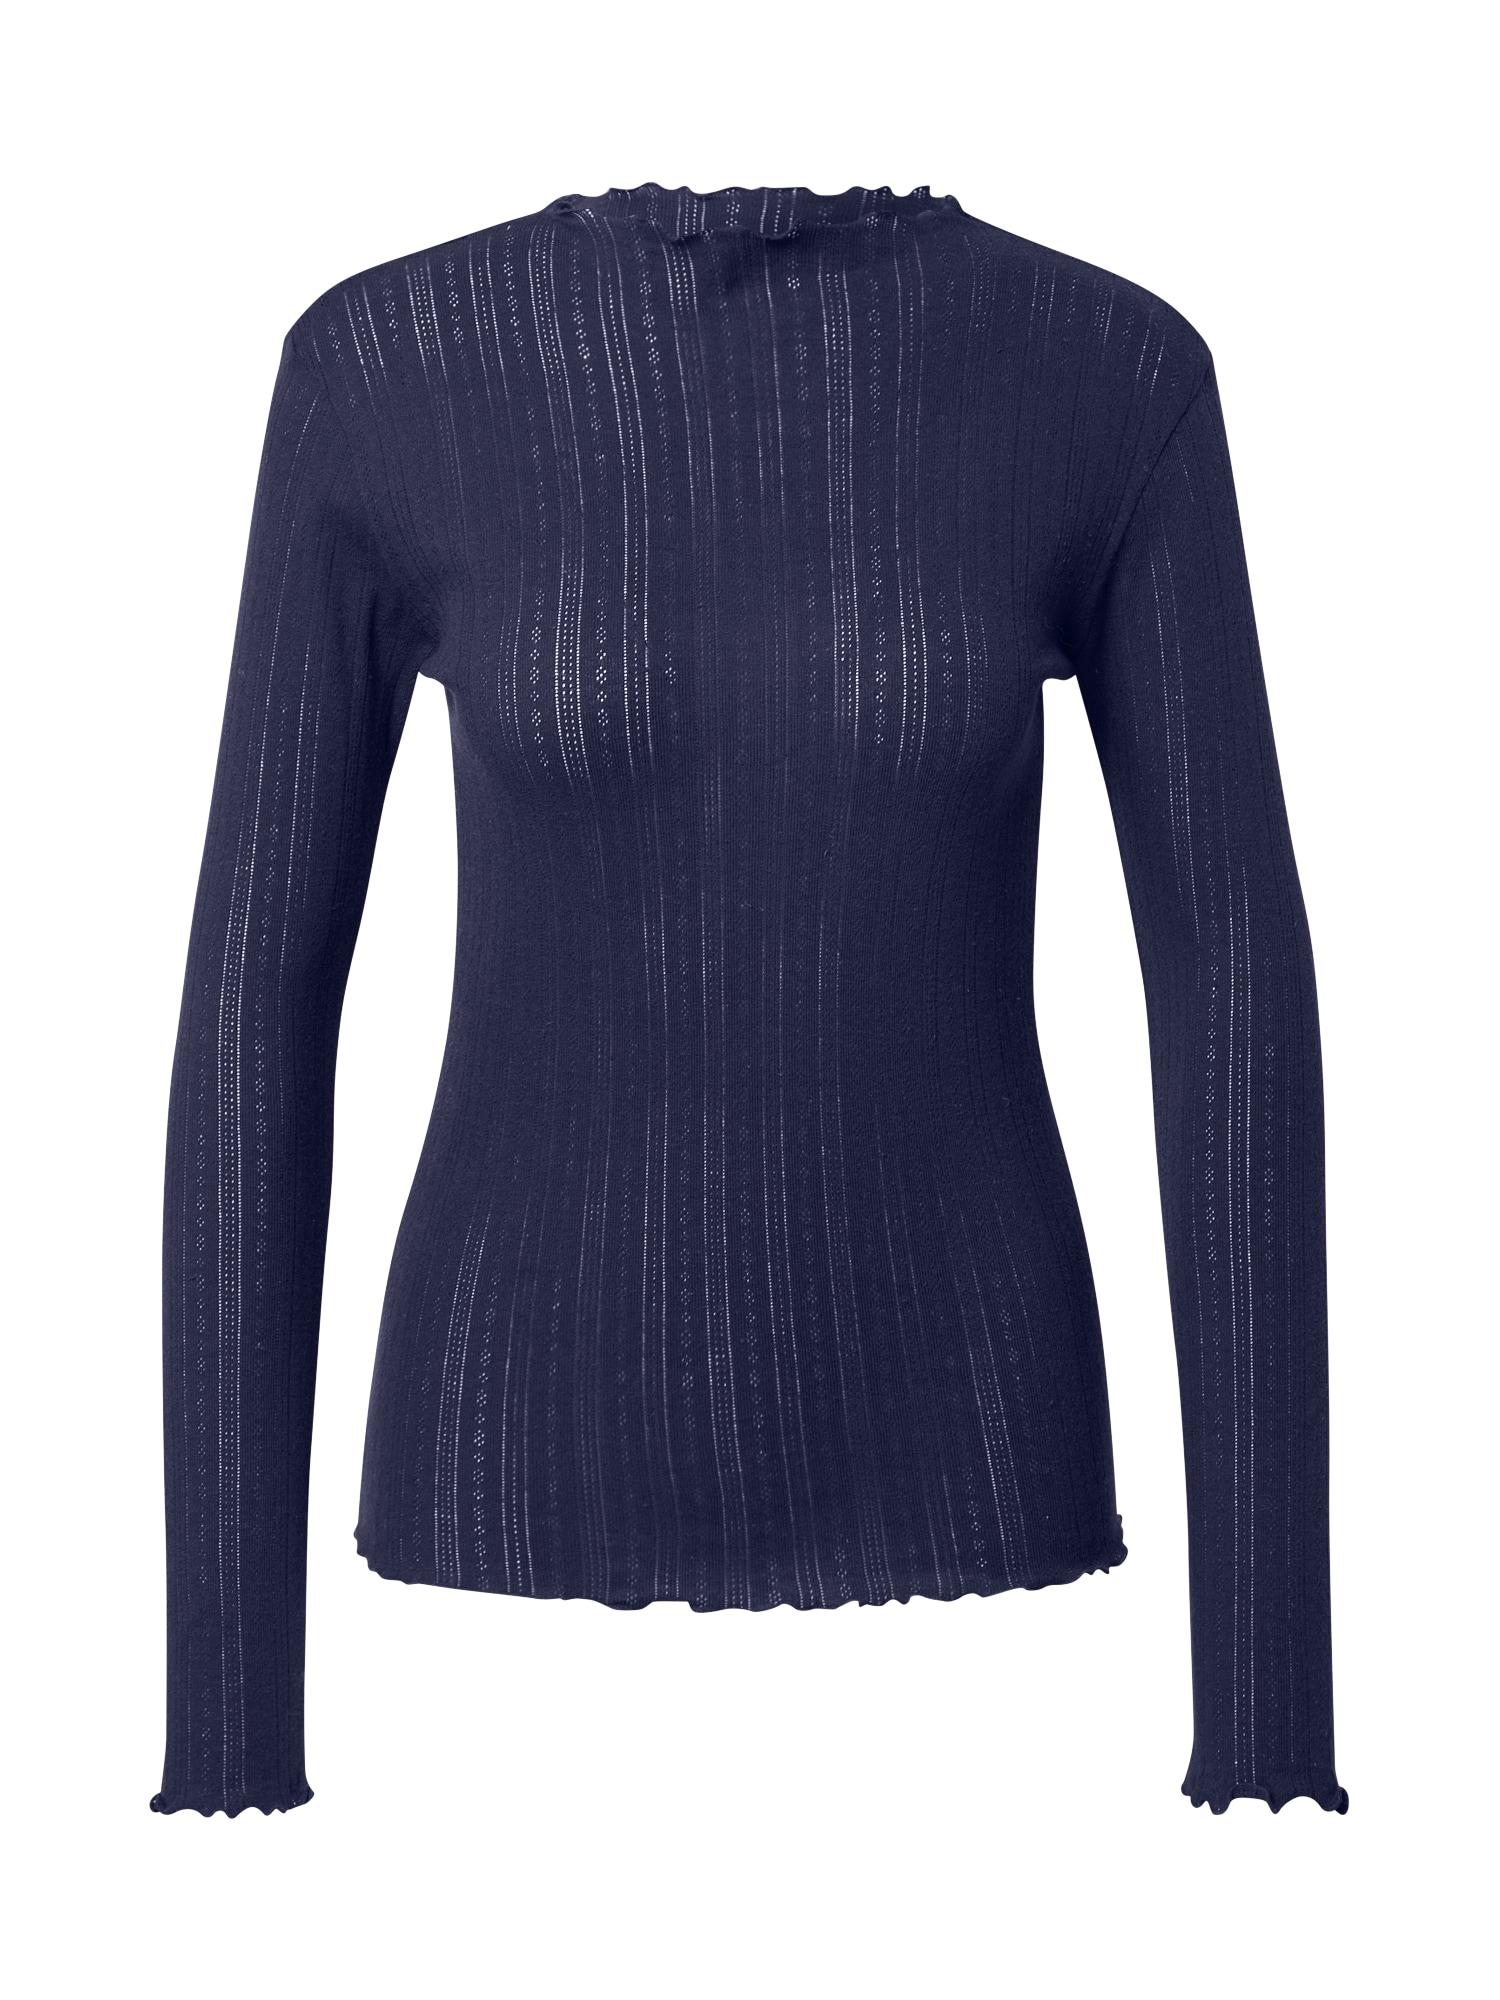 MADS NORGAARD COPENHAGEN Marškinėliai tamsiai mėlyna